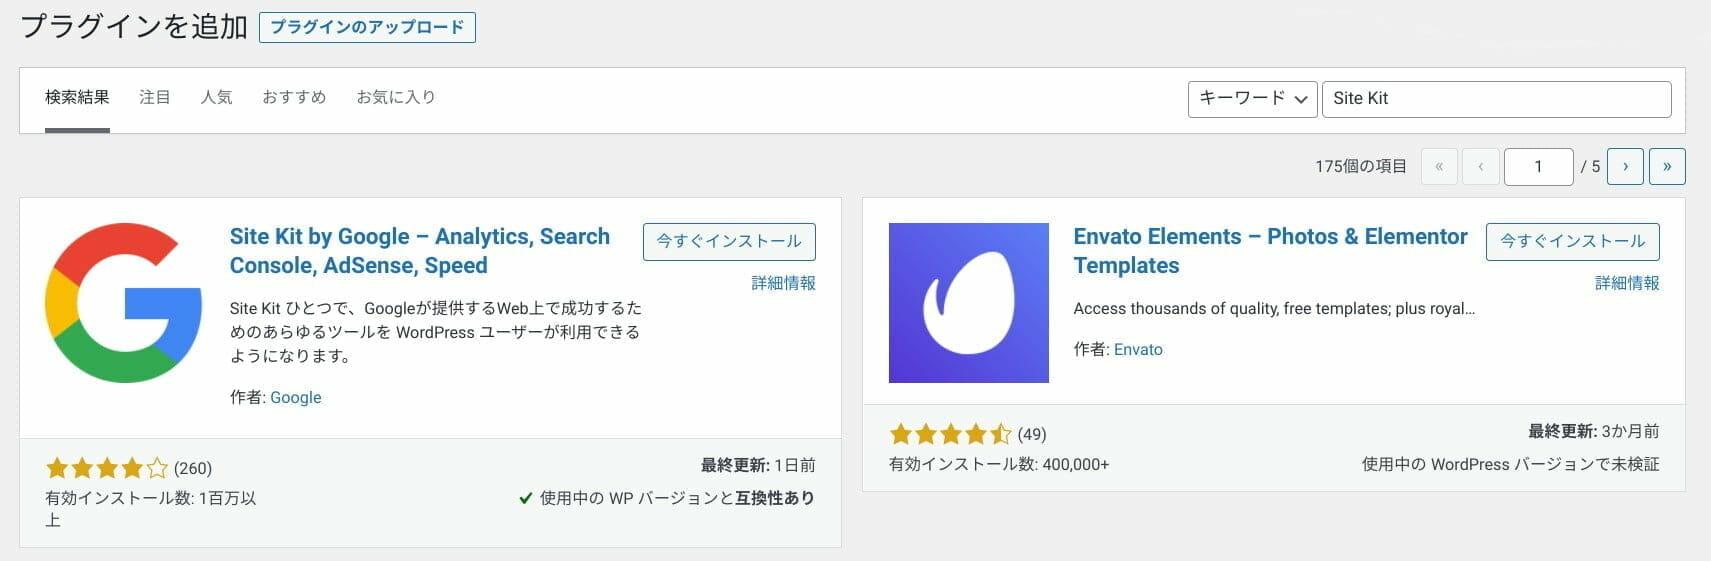 WordPress:Site Kit プラグインをインストール